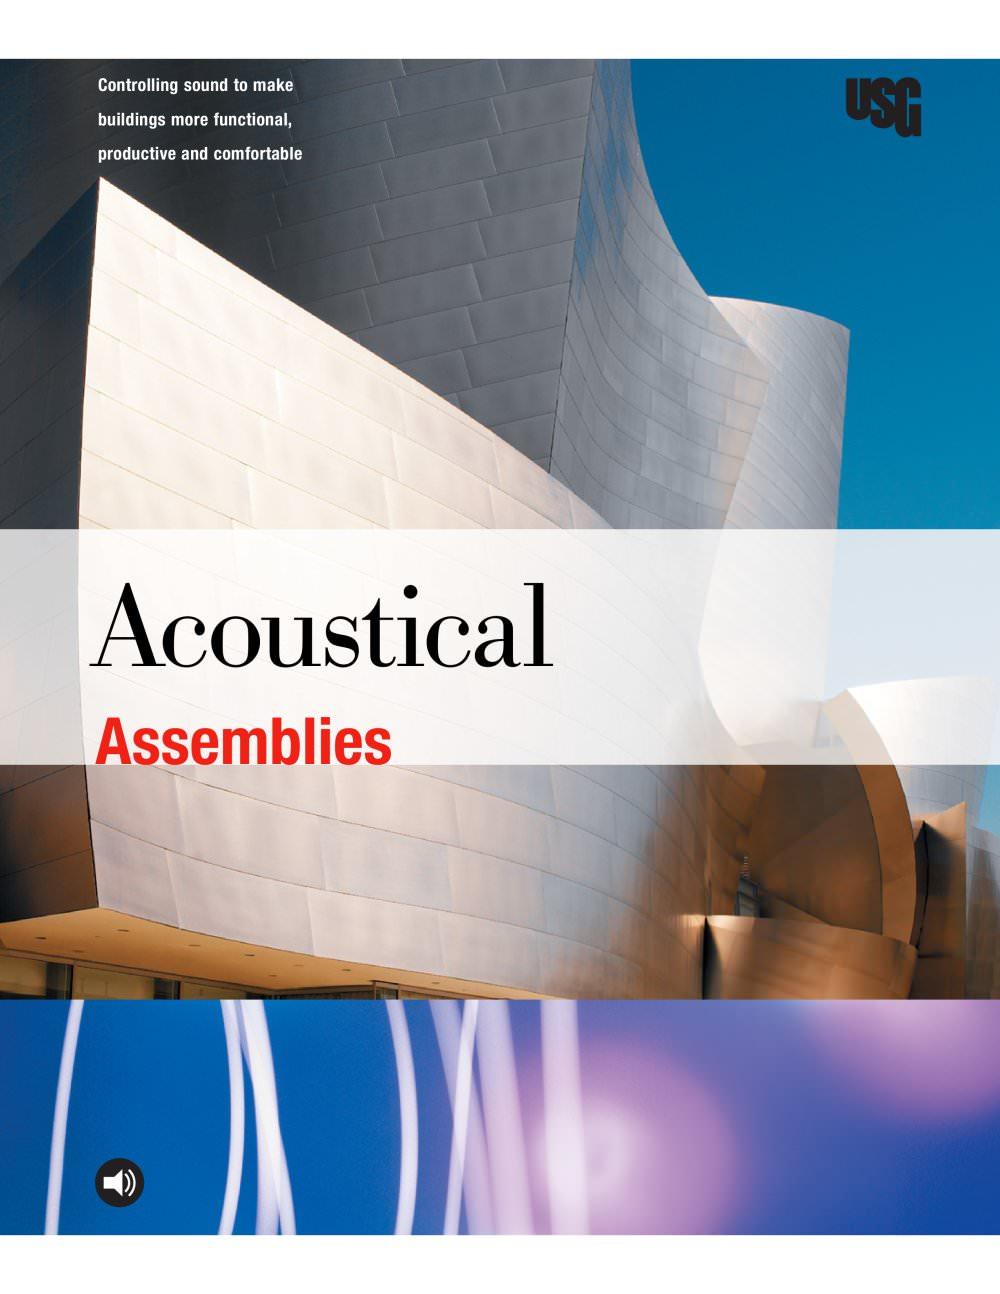 Usg acoustical assemblies brochure usg pdf catalogues usg acoustical assemblies brochure 1 40 pages dailygadgetfo Choice Image